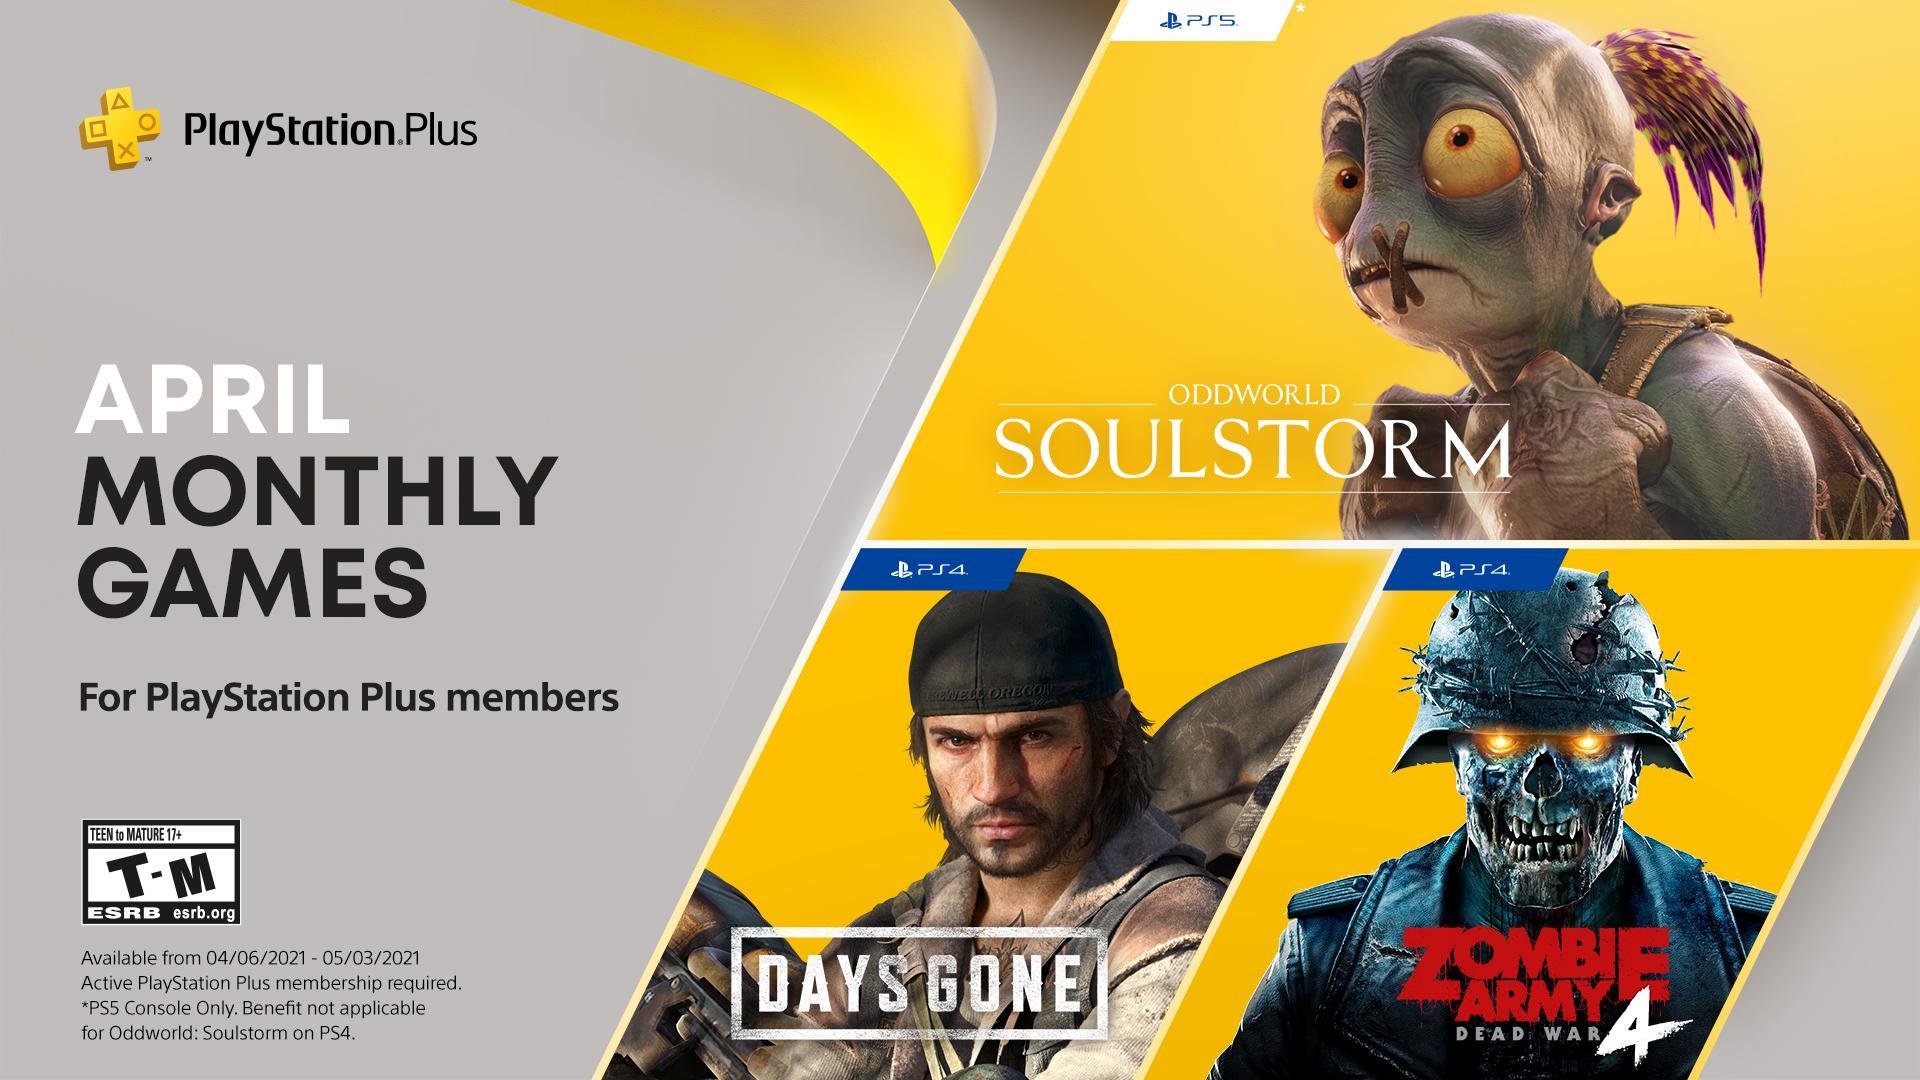 PS Plus Free Games April 2021